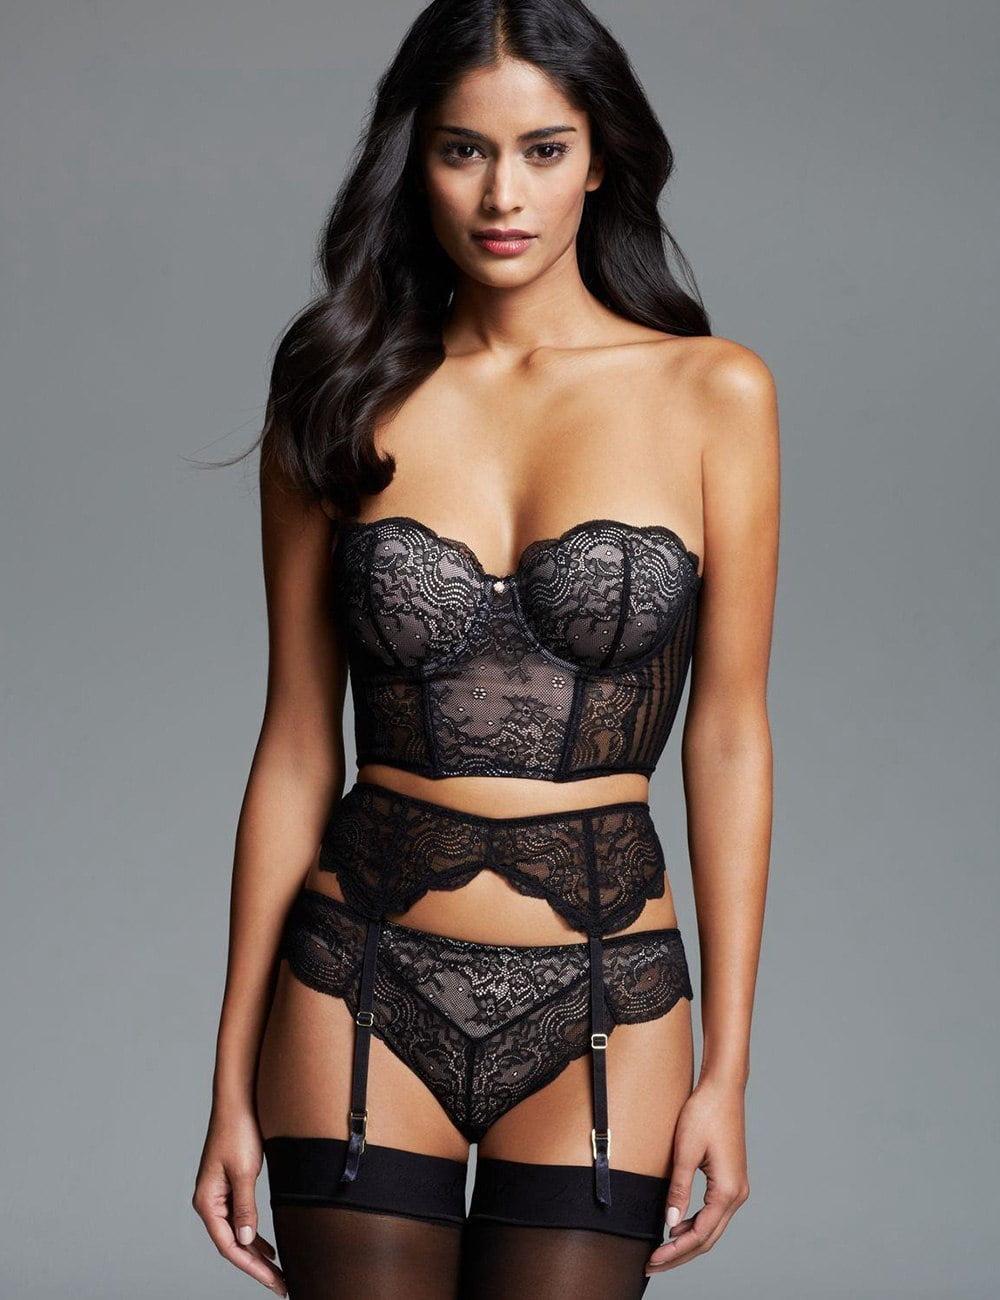 New 2017 women sexy lingerie hot Erotic Lingerie Sexy Valentine Sleepwear Plus size 3 Piece Delicate lace Bra Set R80457 4